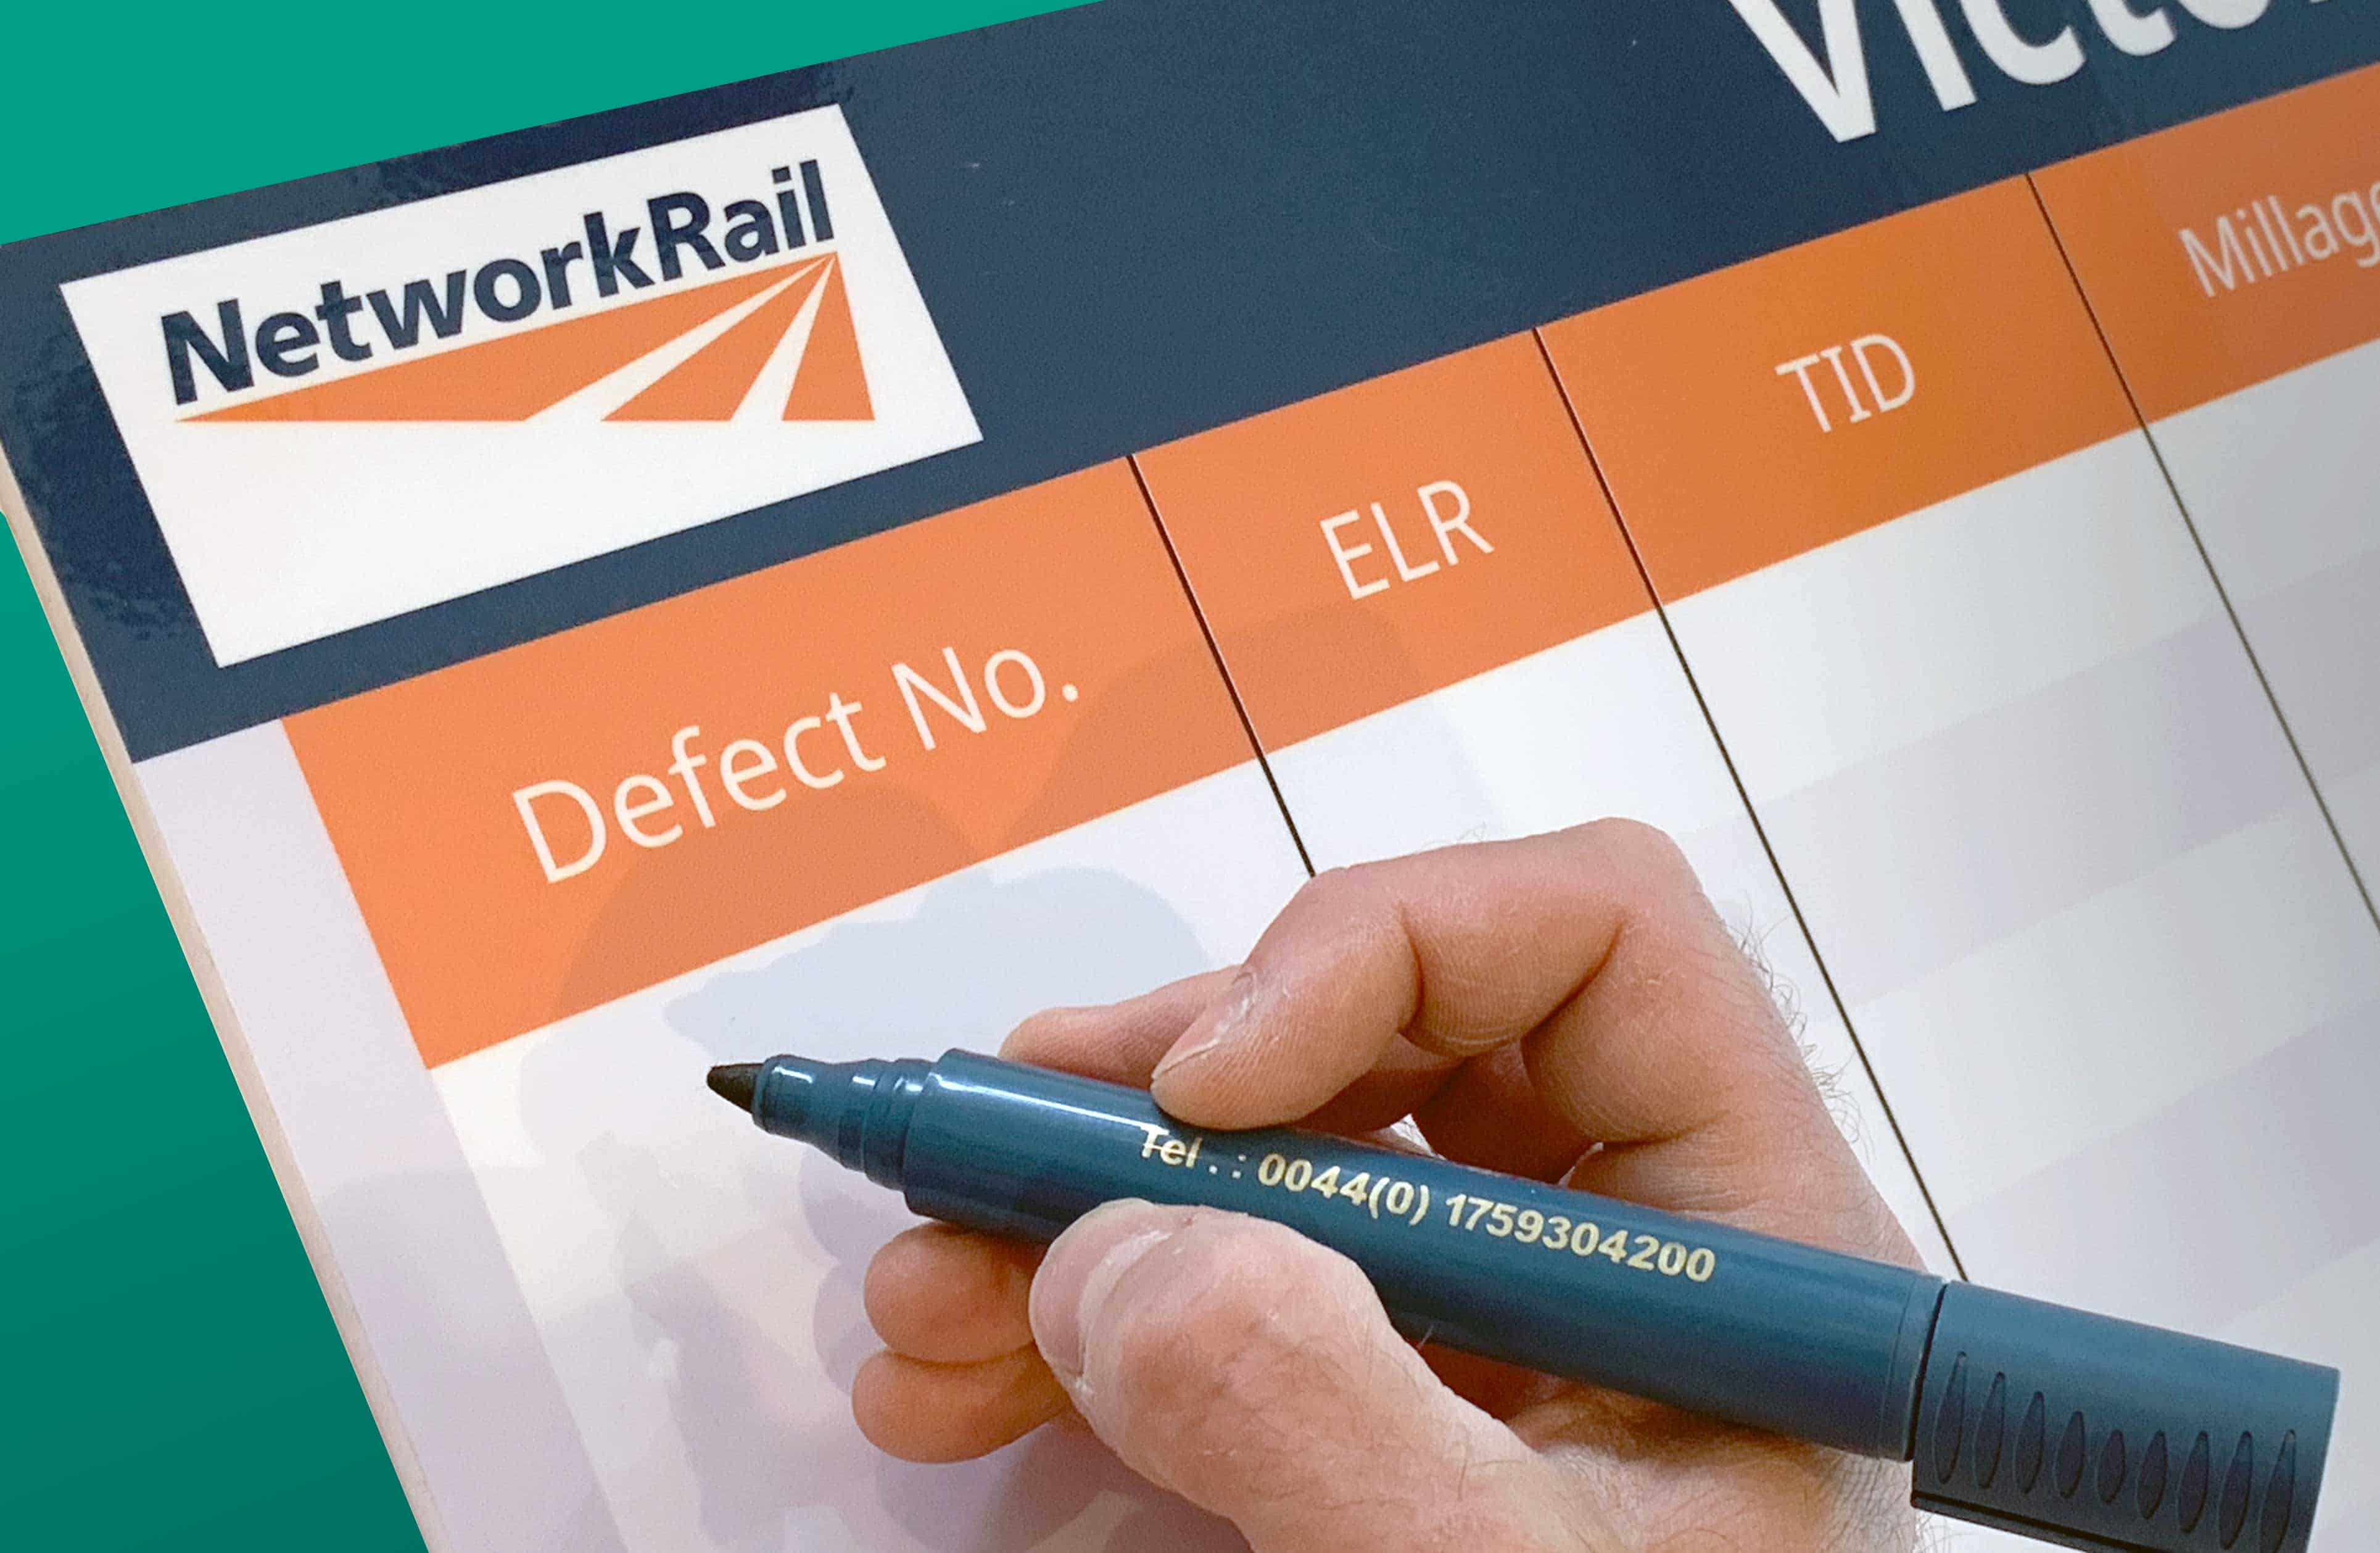 network rail kpi board